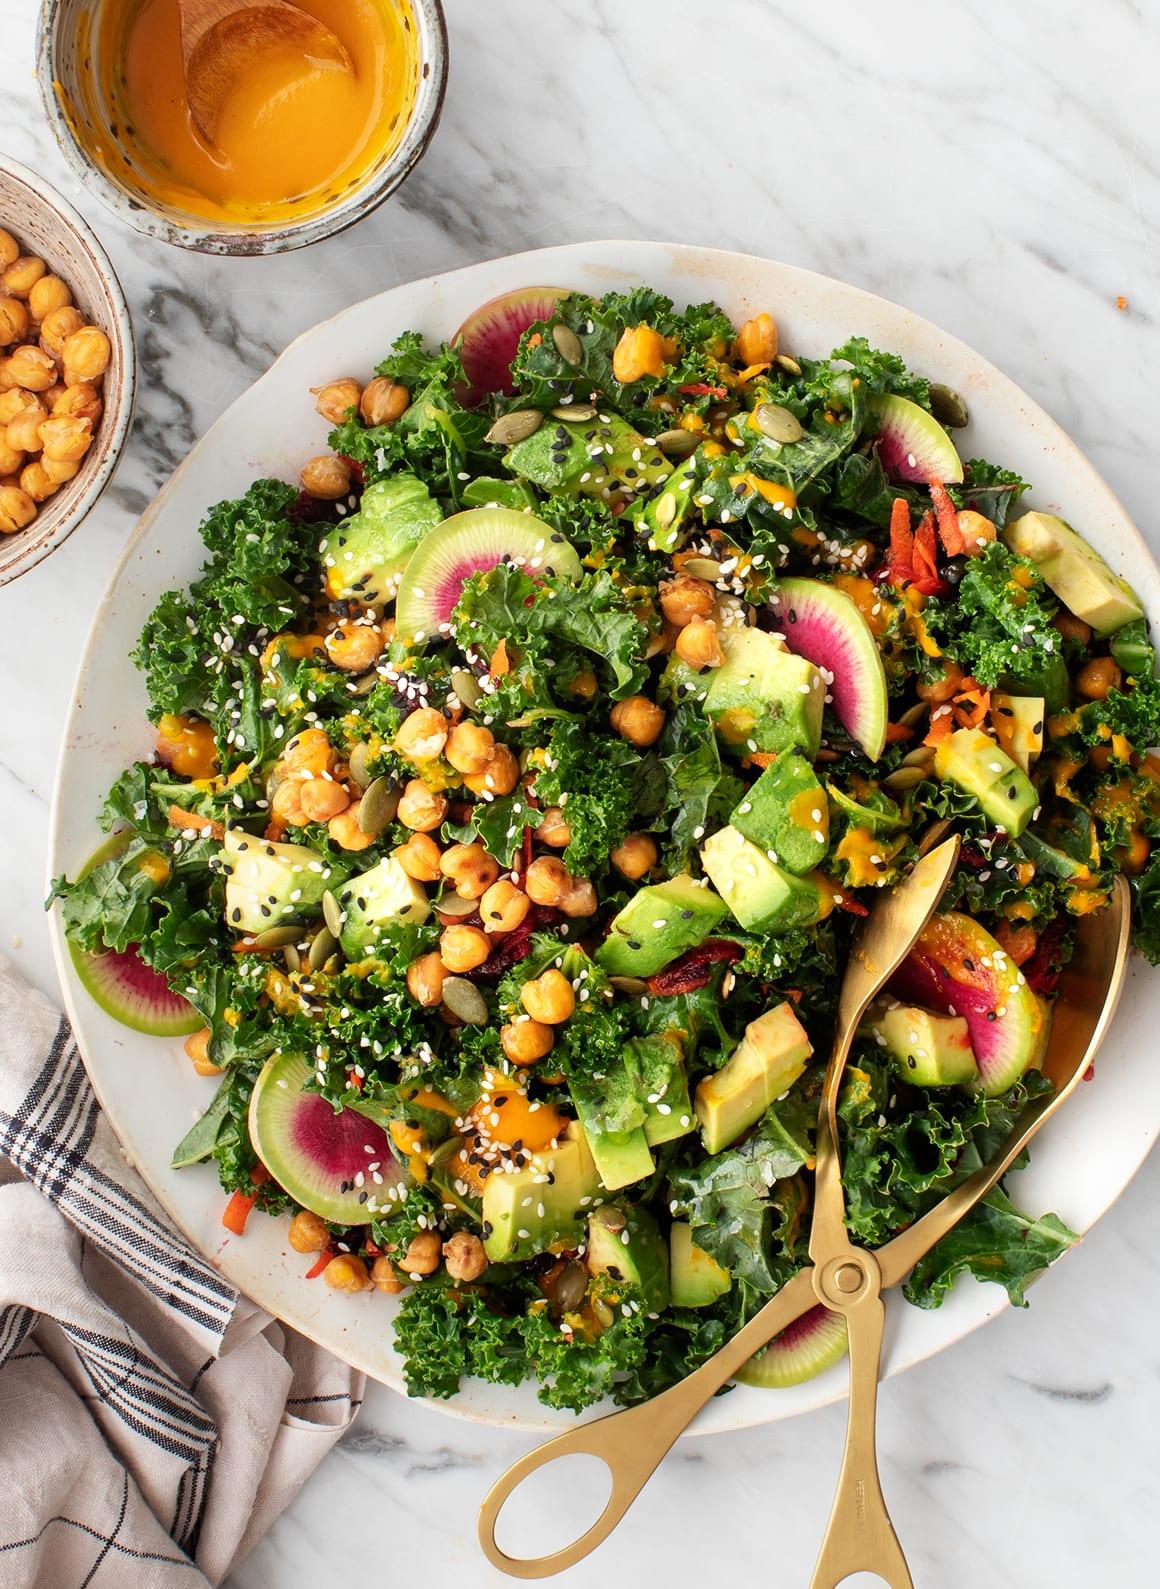 The Origin India Kele salad